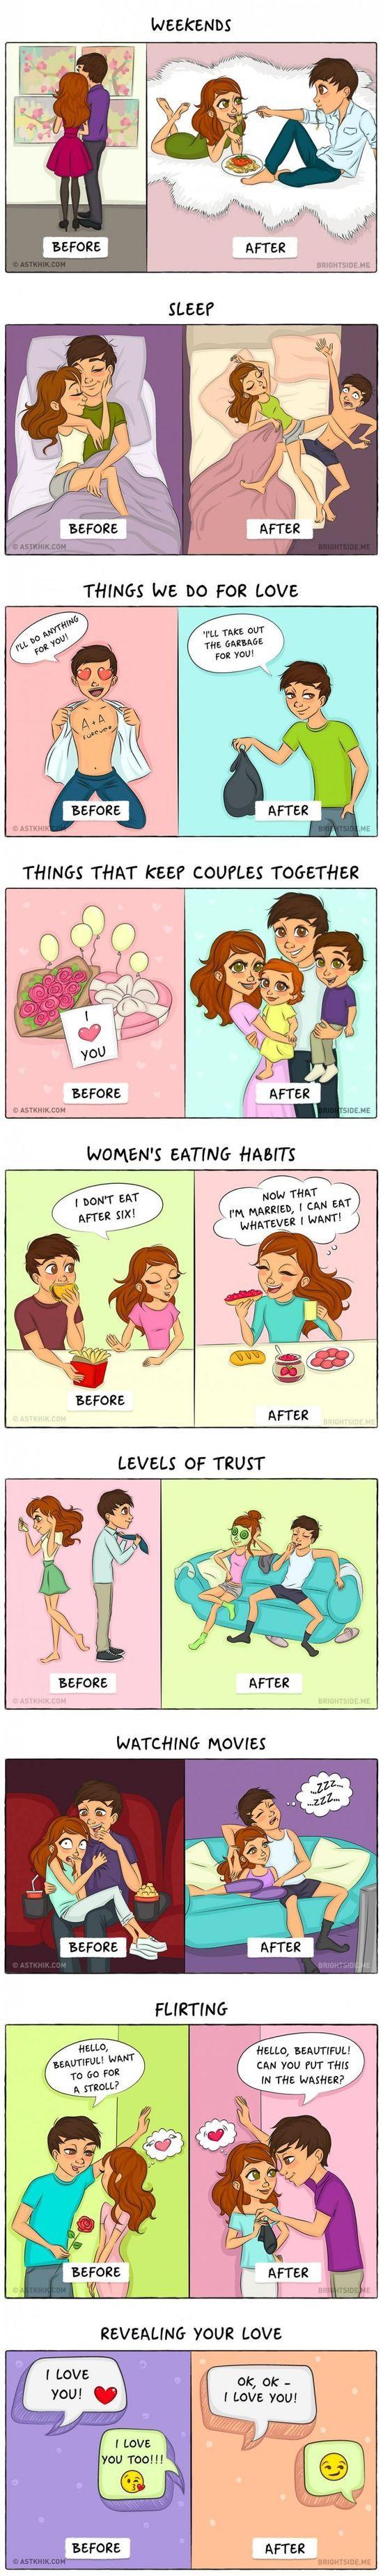 Dating Vs Marriage #lol #haha #funny